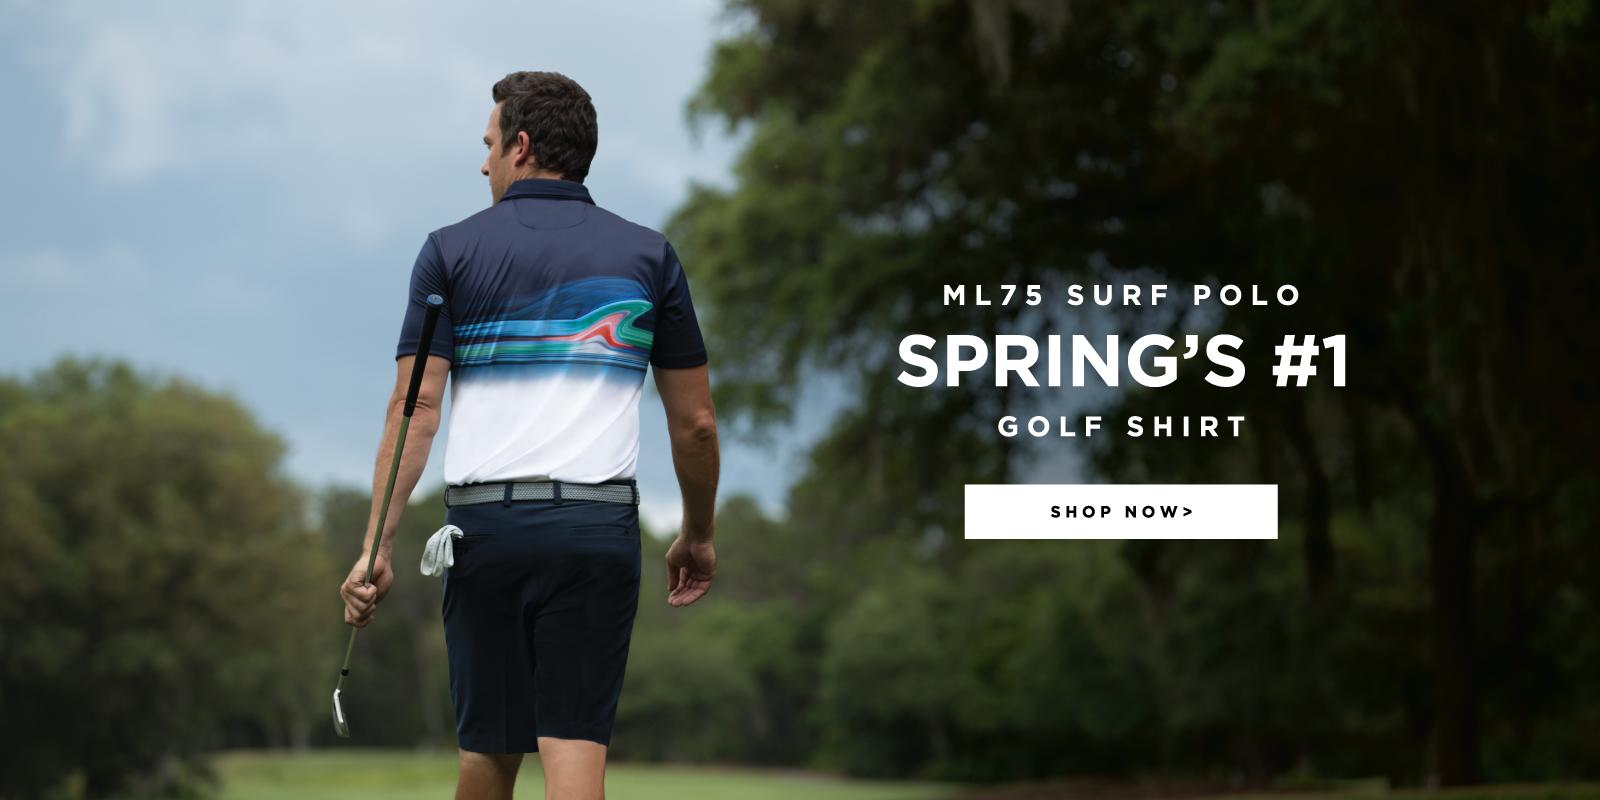 ML75 Surf Polo Spring's #1 Golf Shirt Shop Now